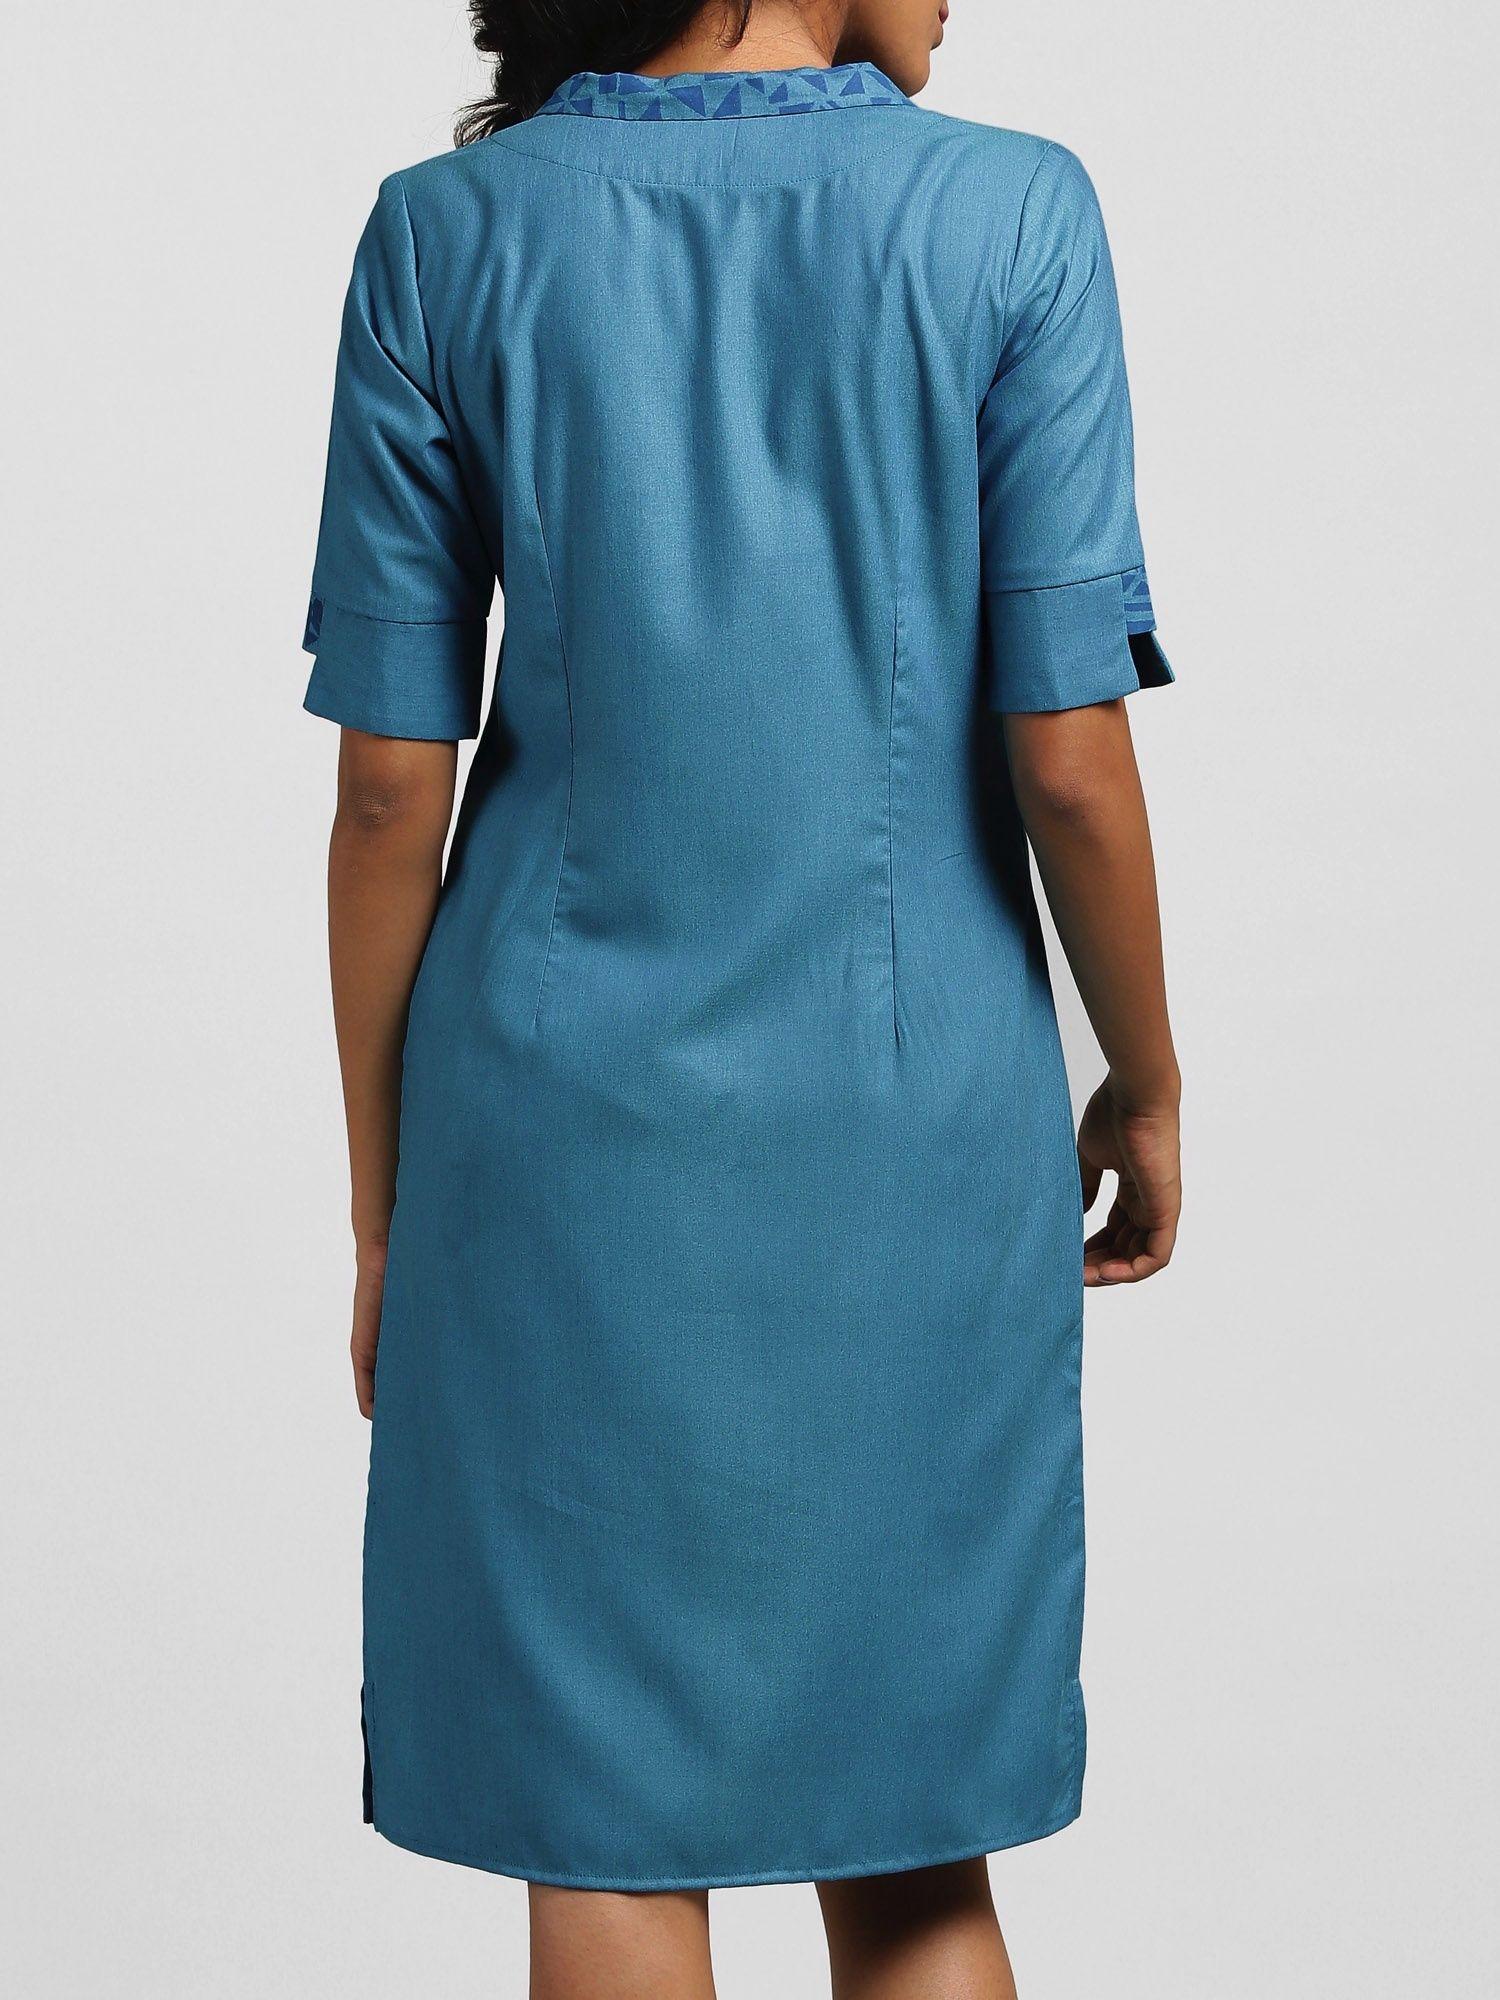 d50f373e32 FableStreet Dresses   Buy FableStreet Side Button Asymmetric Collar Block  Print Shift Dress - Malibu Blue Online